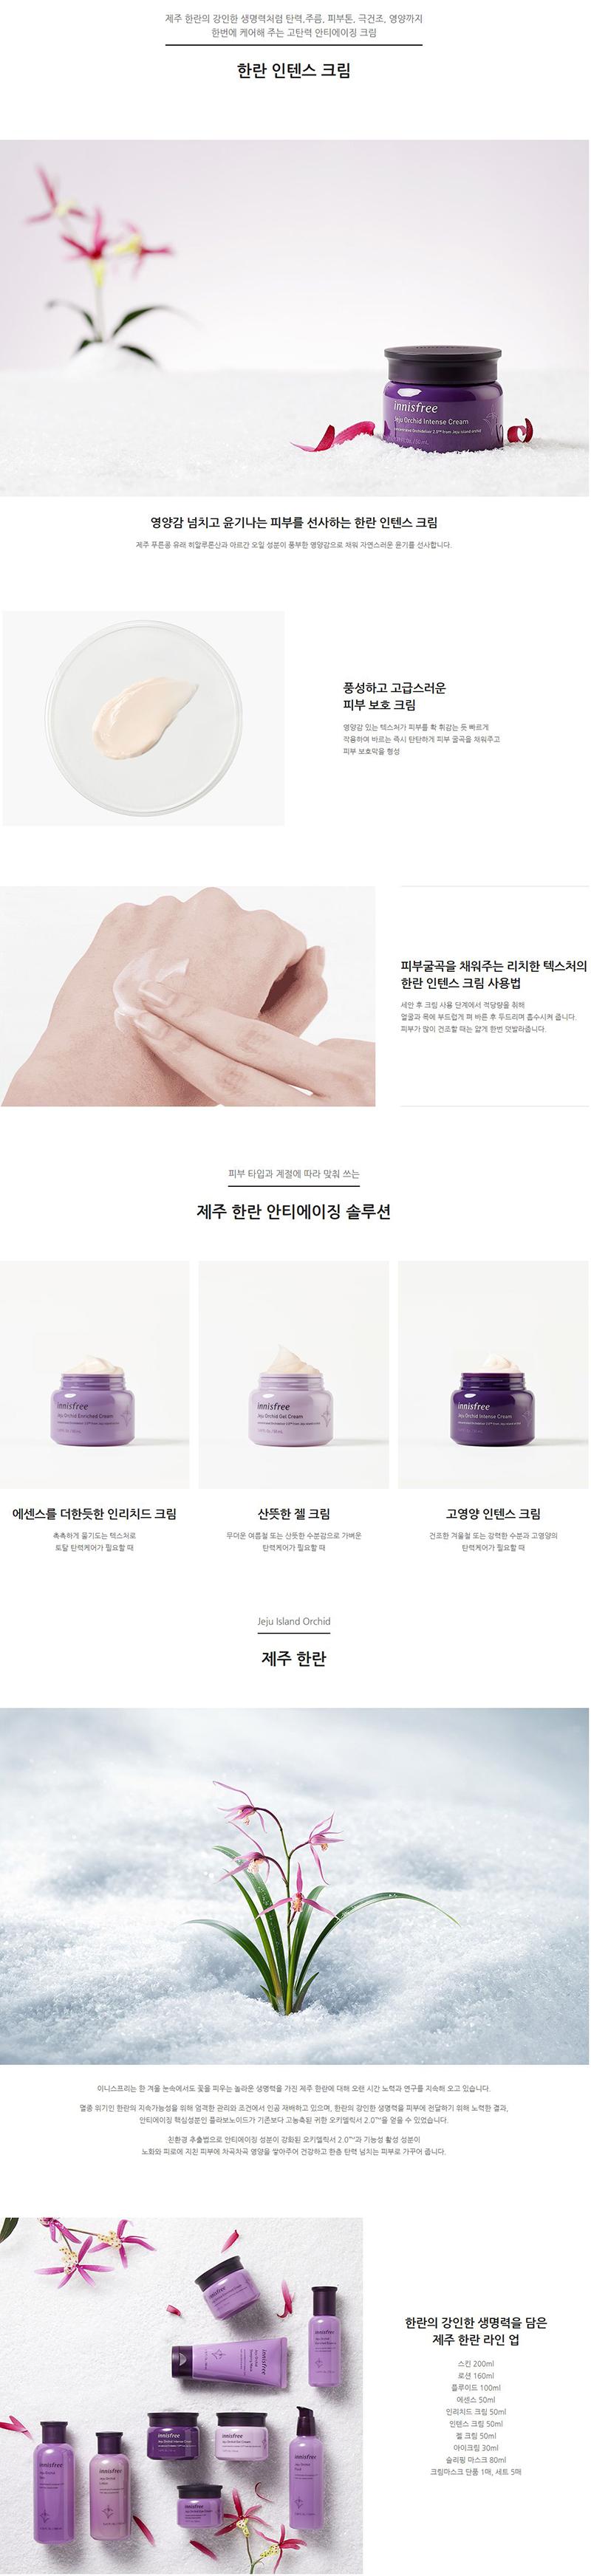 innisfree - Jeju Orchid Intense Cream (2019)